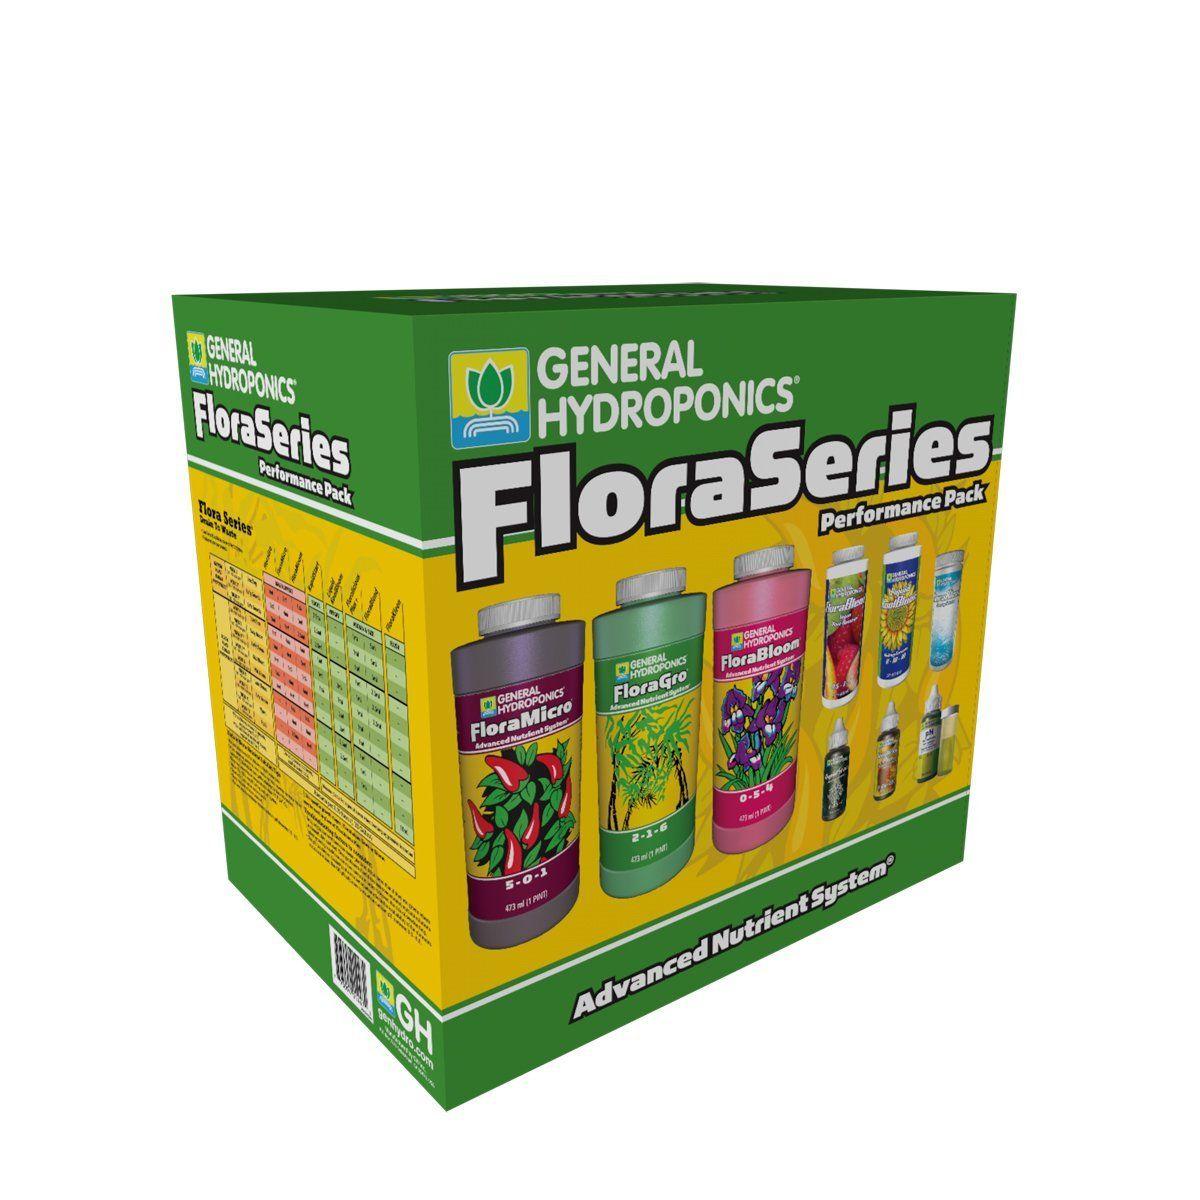 General Hydroponics Flora Series Performance Pack Amazon 400 x 300